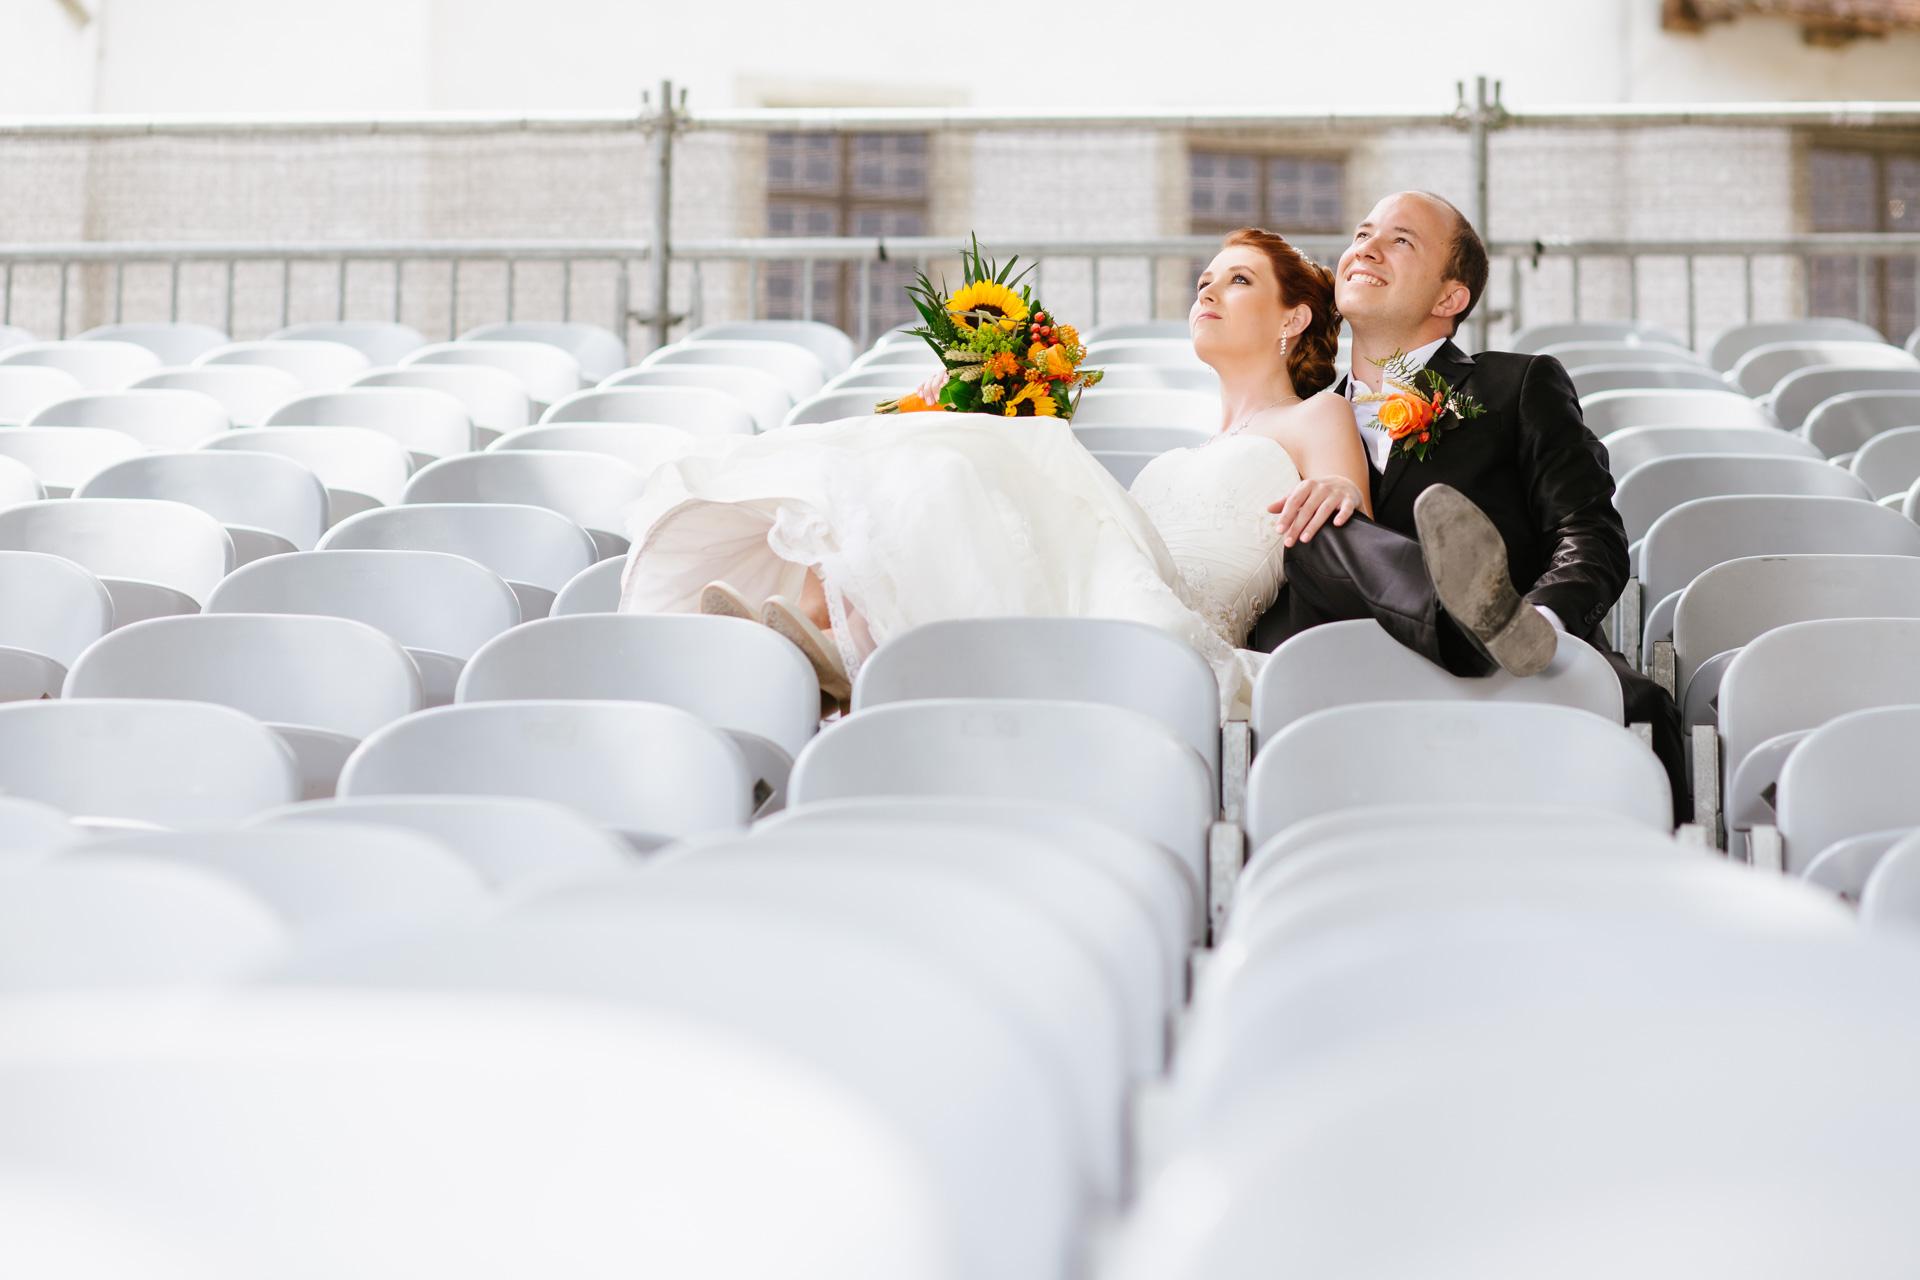 Pixelart_Hochzeitsfotografen_Loerrach_Rheinfelden_Hallwil_Schweiz_Linda-Ramon-1010